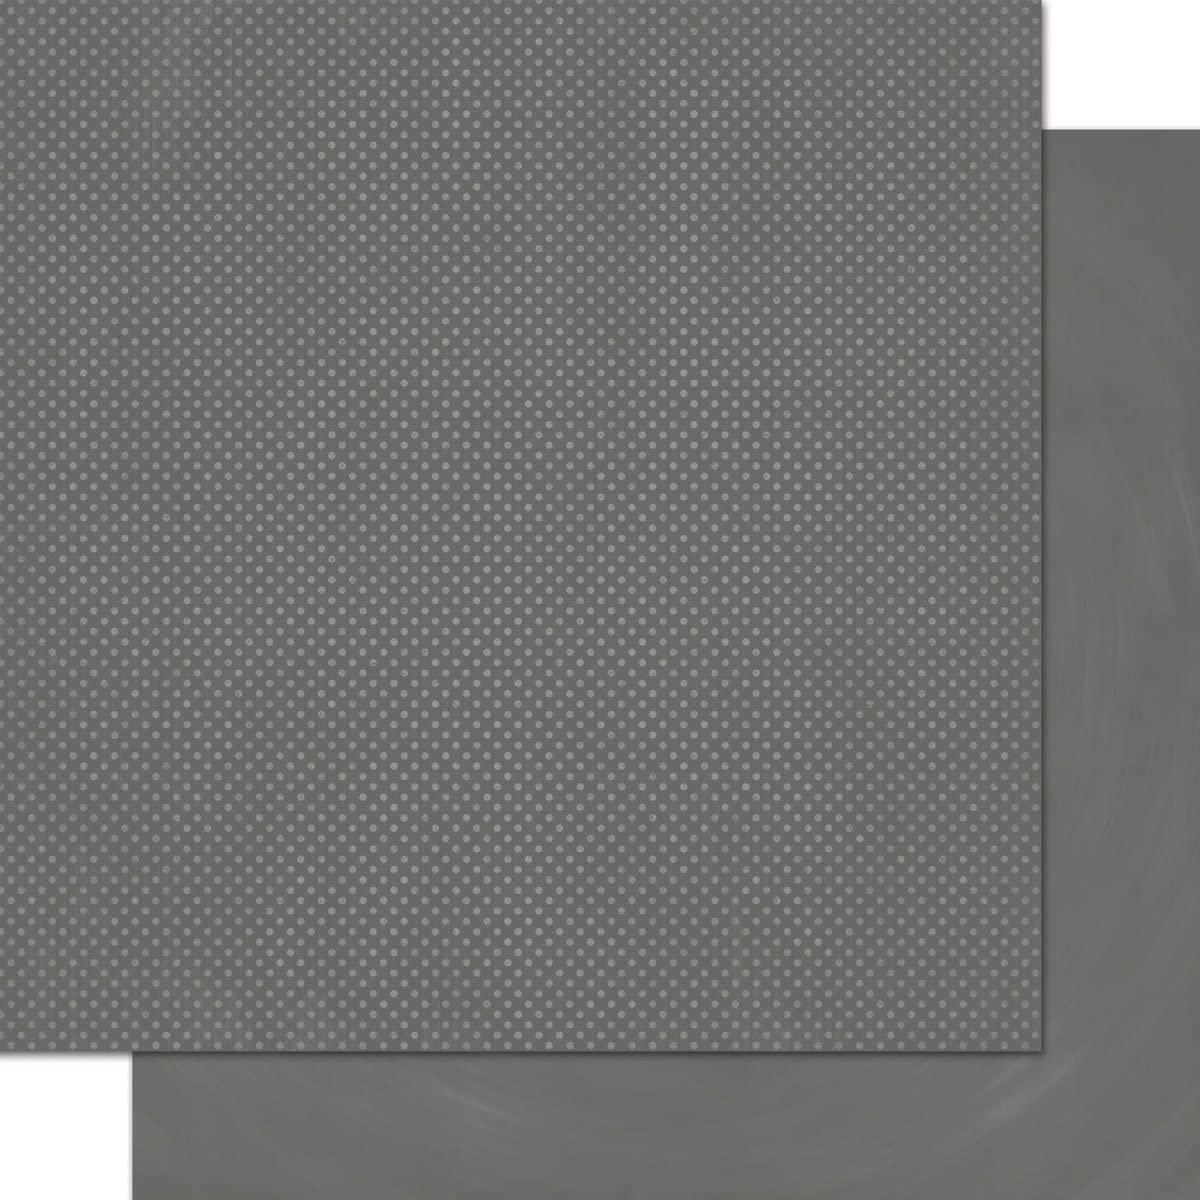 Bo Bunny Double Dot Paper 12x12 Charcoal